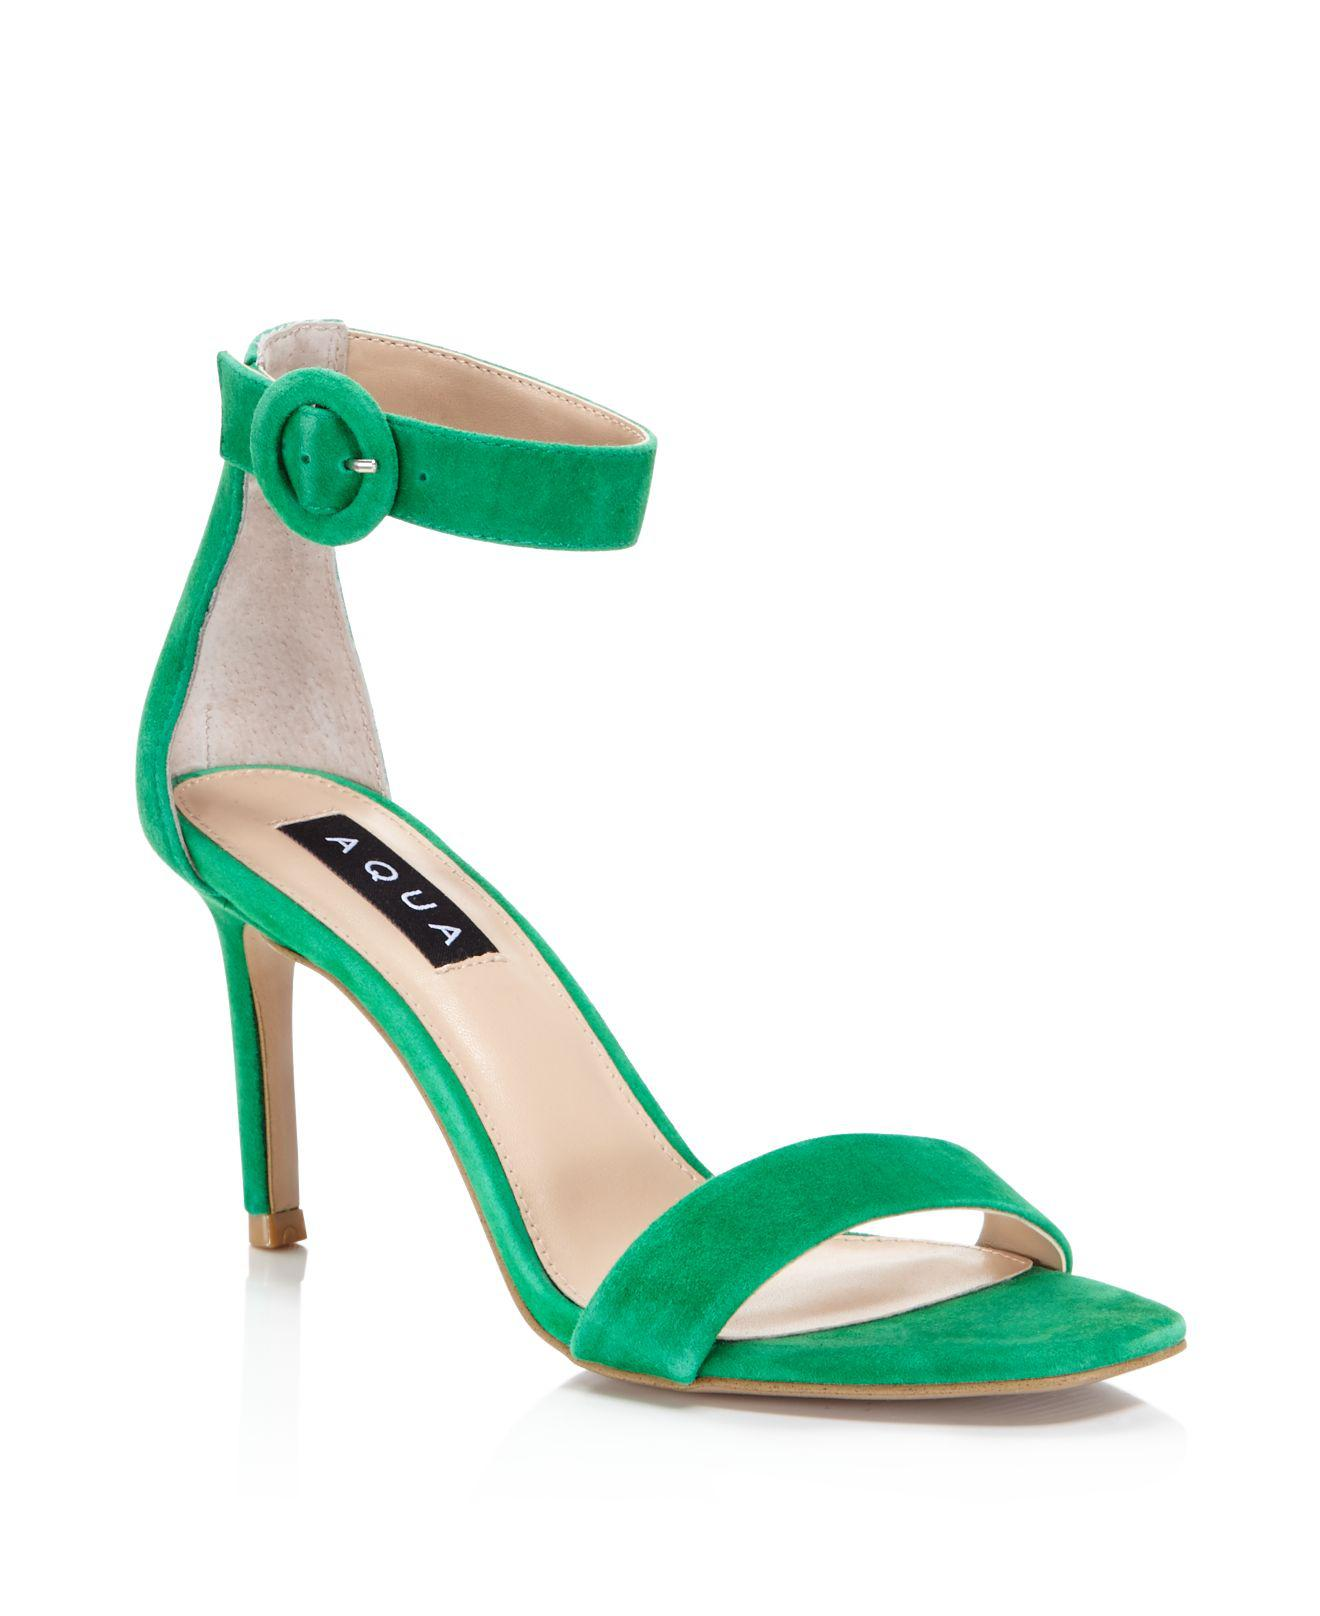 Aqua Women's Seven Suede High-Heel Ankle Strap Sandals - 100% Exclusive OtUXpT